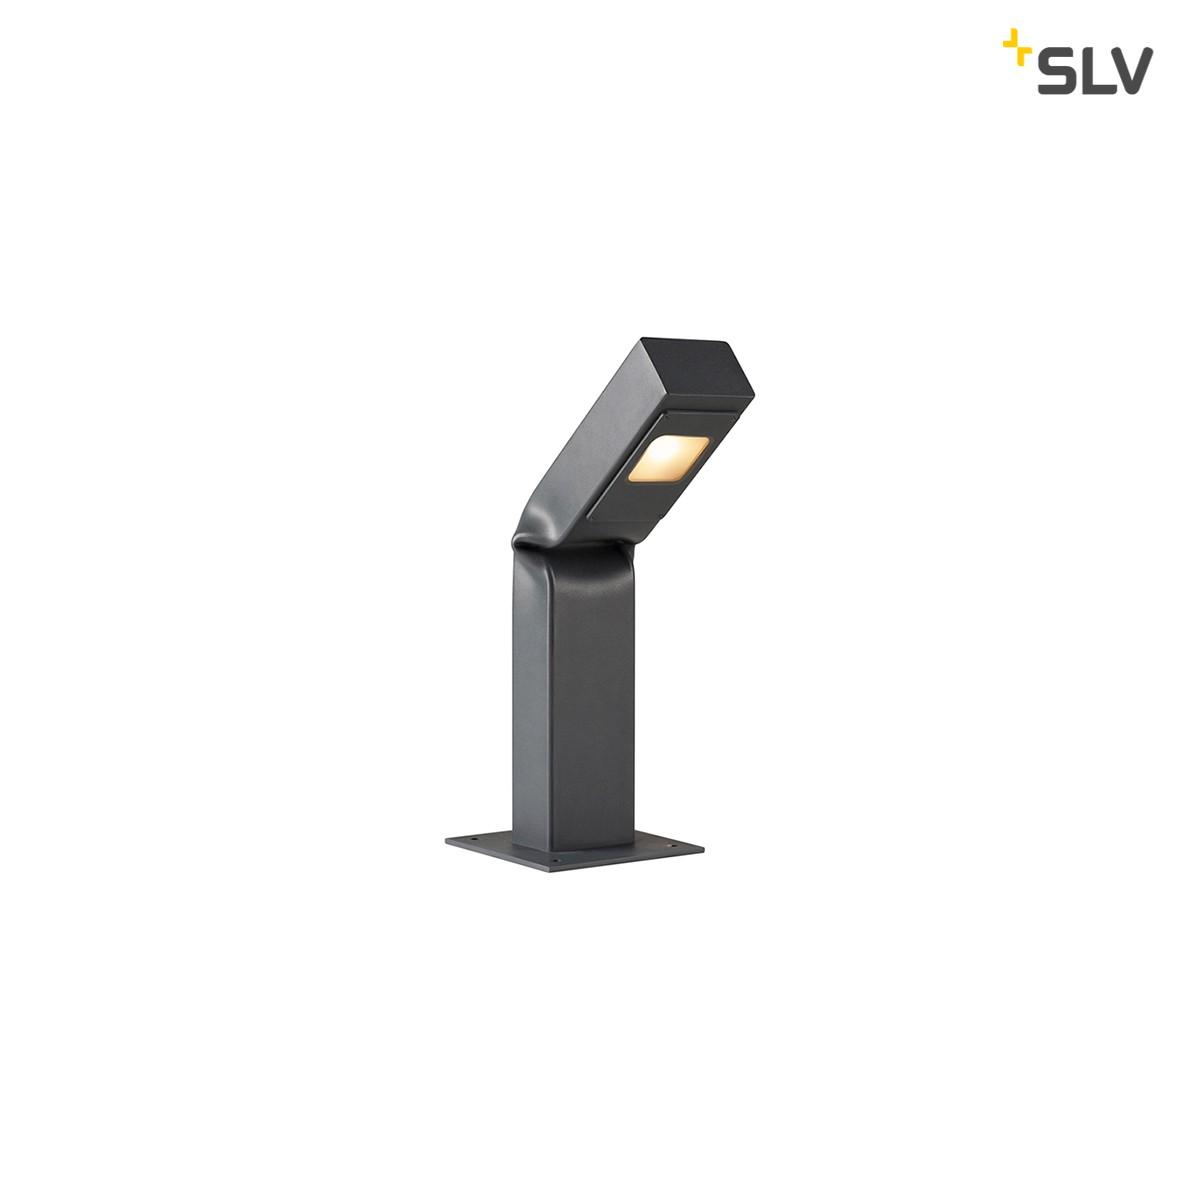 SLV Bendo LED Pollerleuchte, Höhe: 42 cm, anthrazit